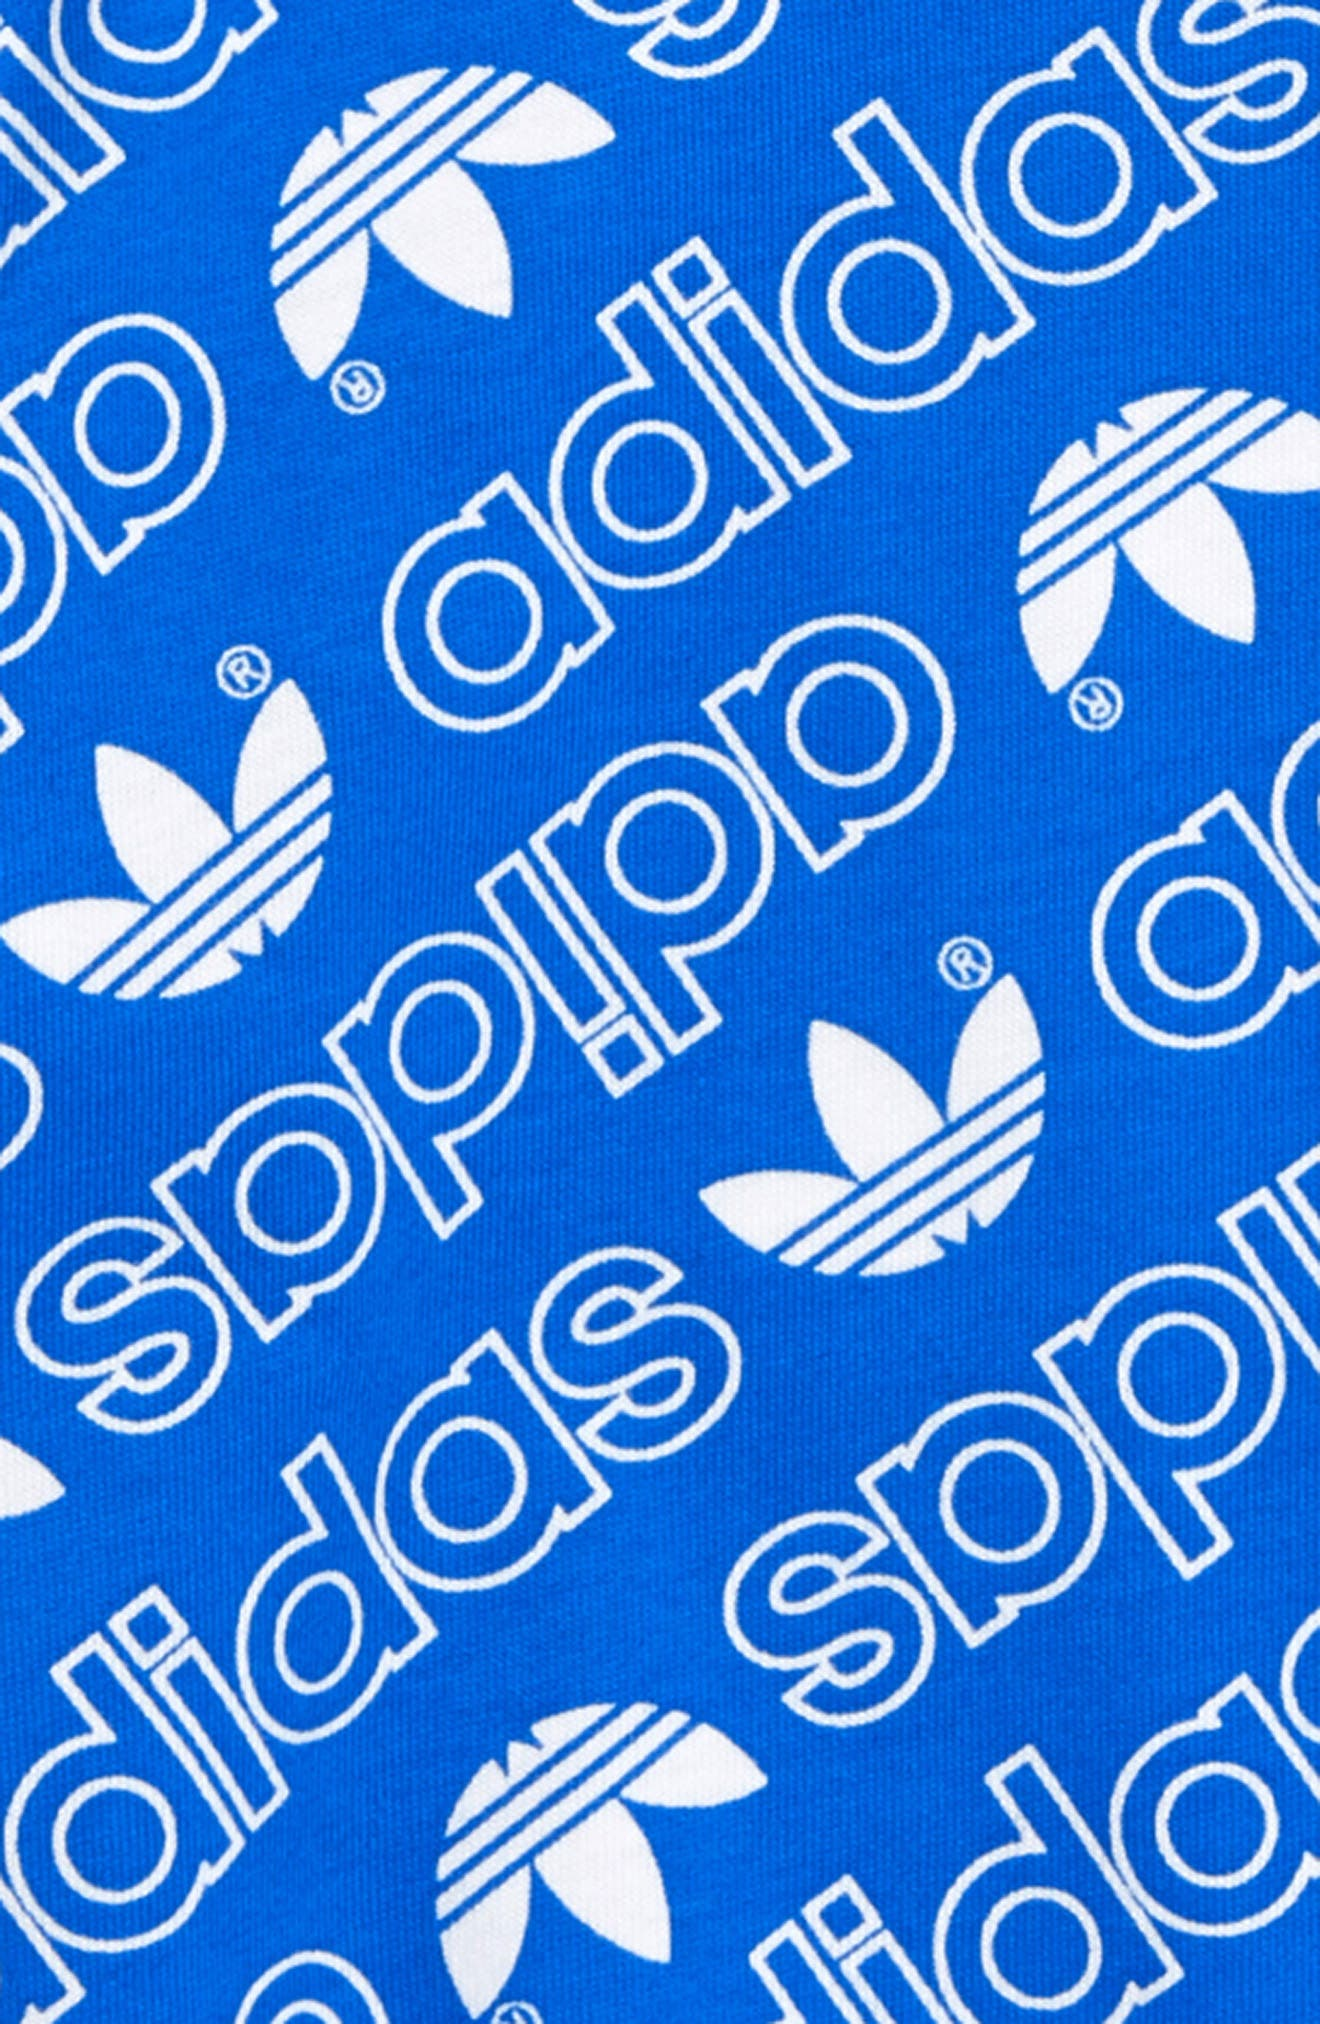 ADIDAS ORIGINALS,                             Trefoil Logo T-Shirt,                             Alternate thumbnail 2, color,                             430